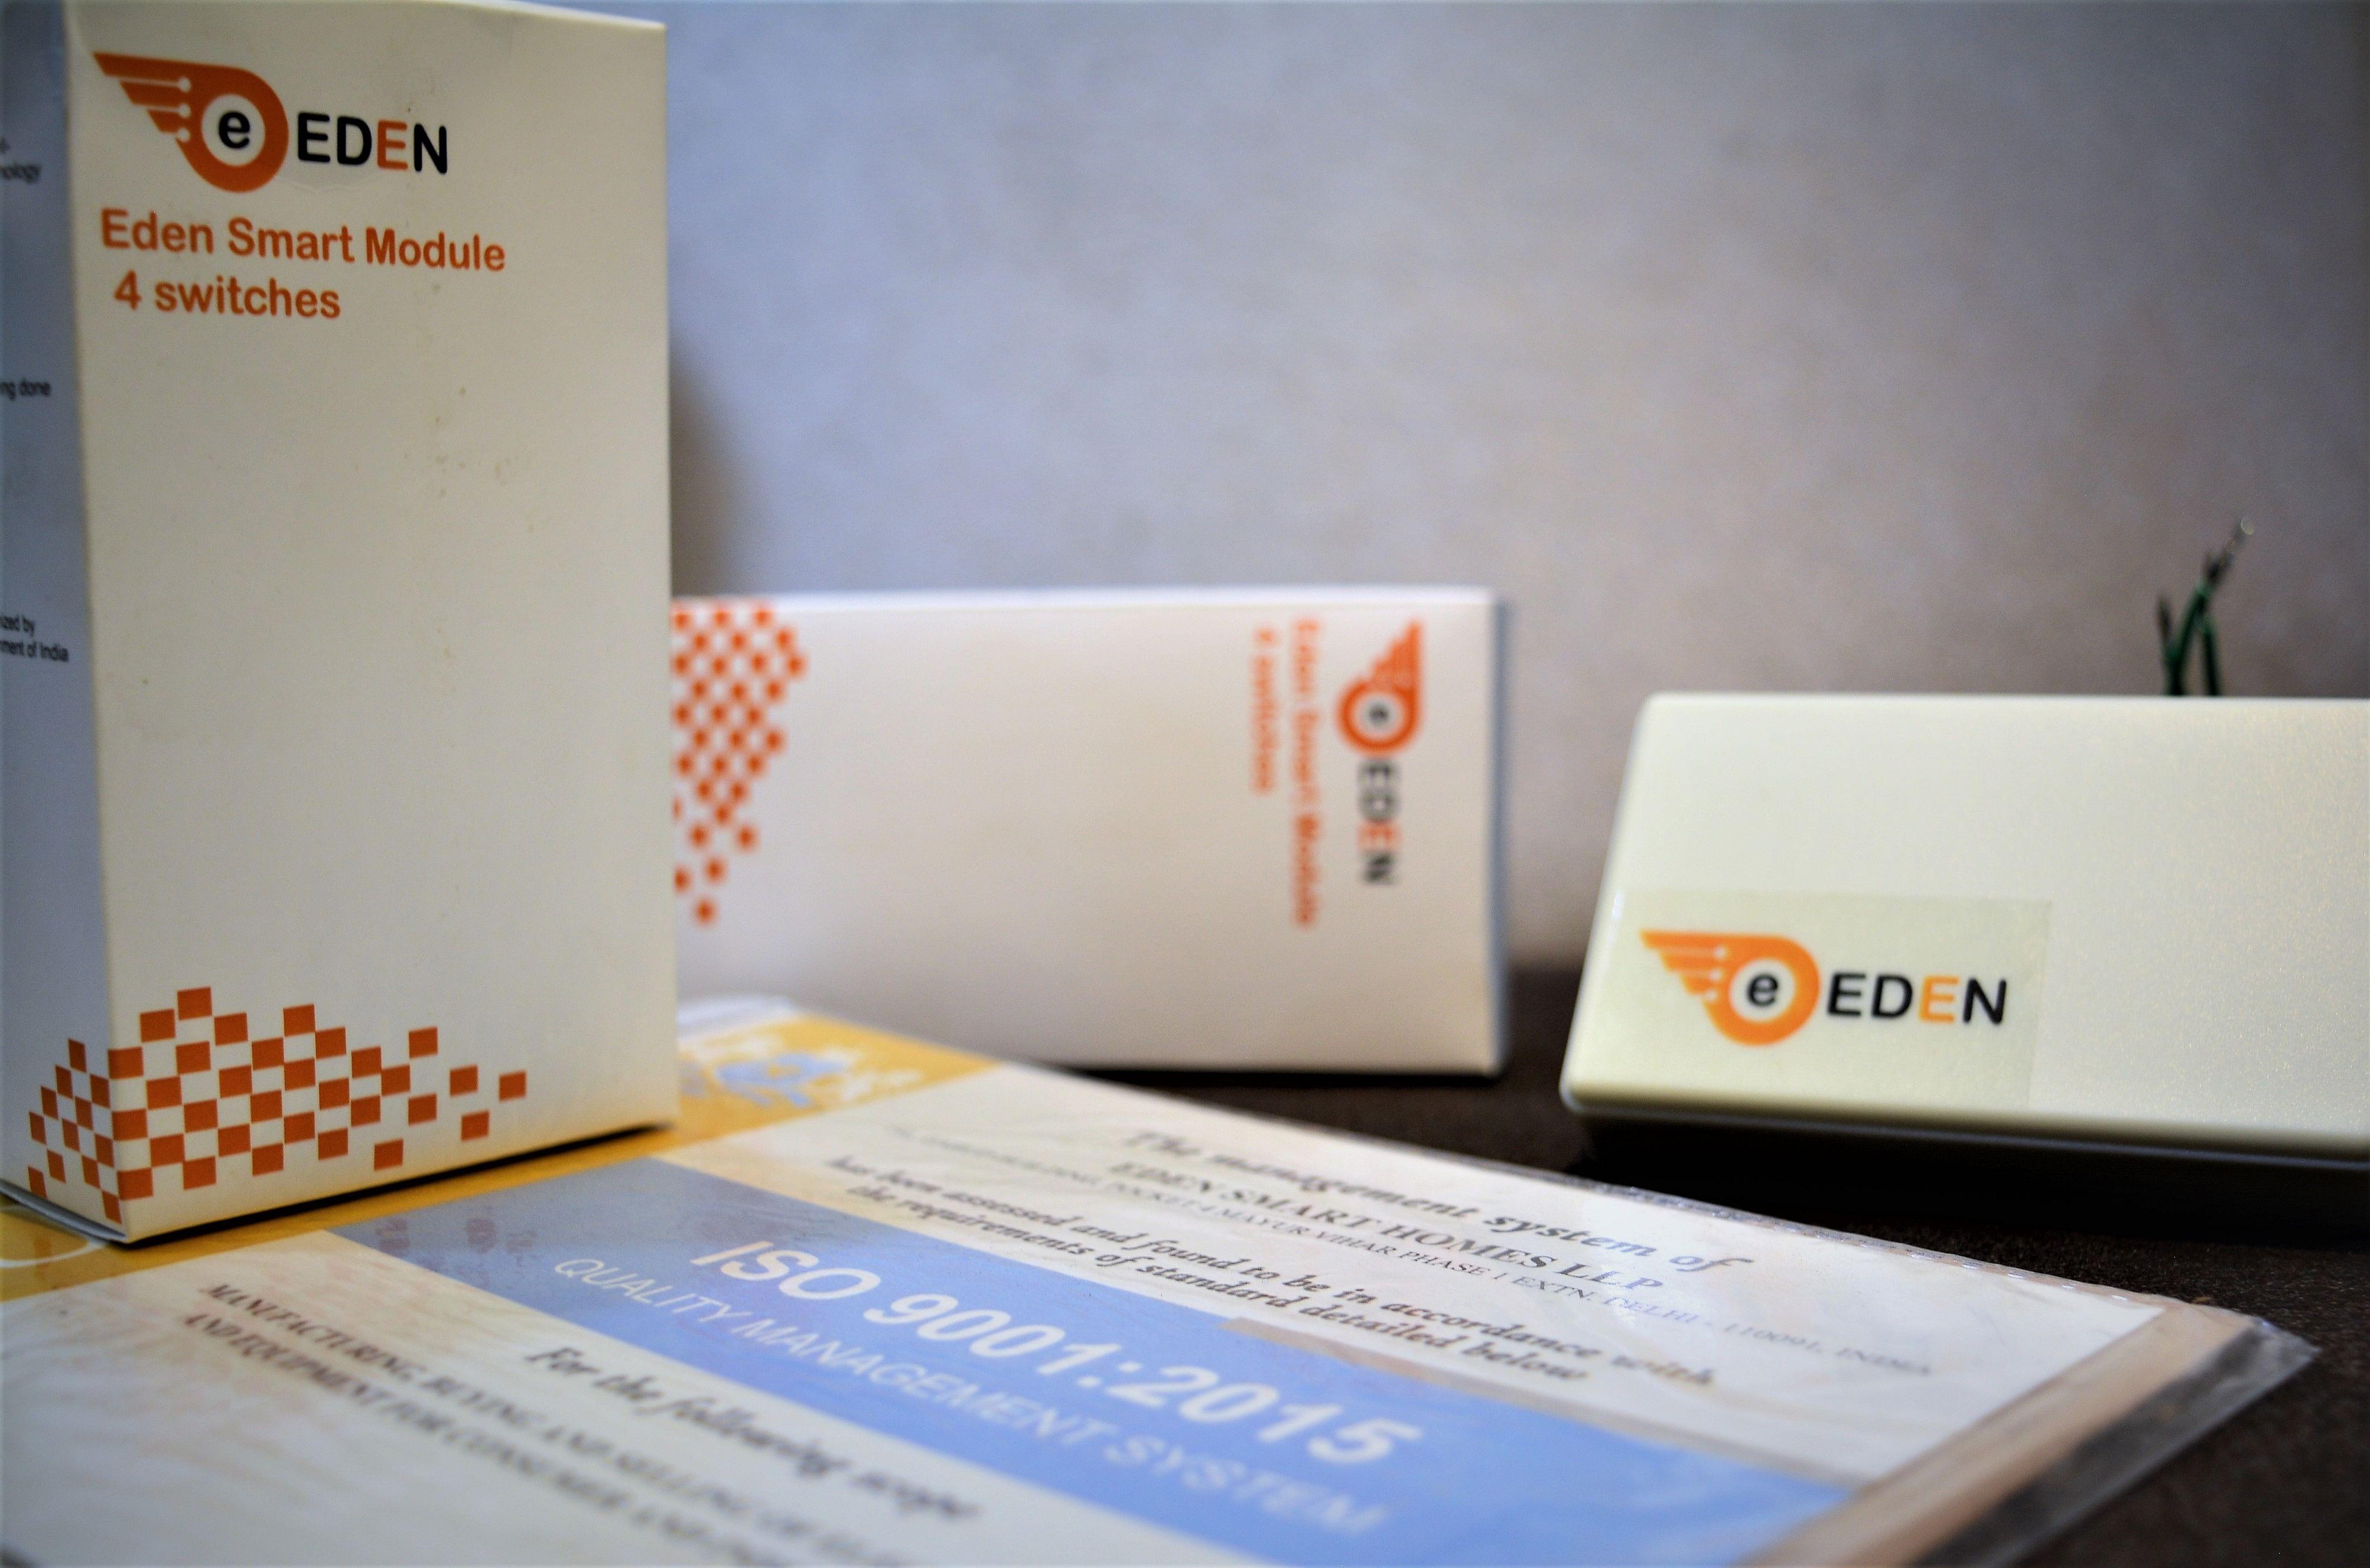 Eden smart home modules